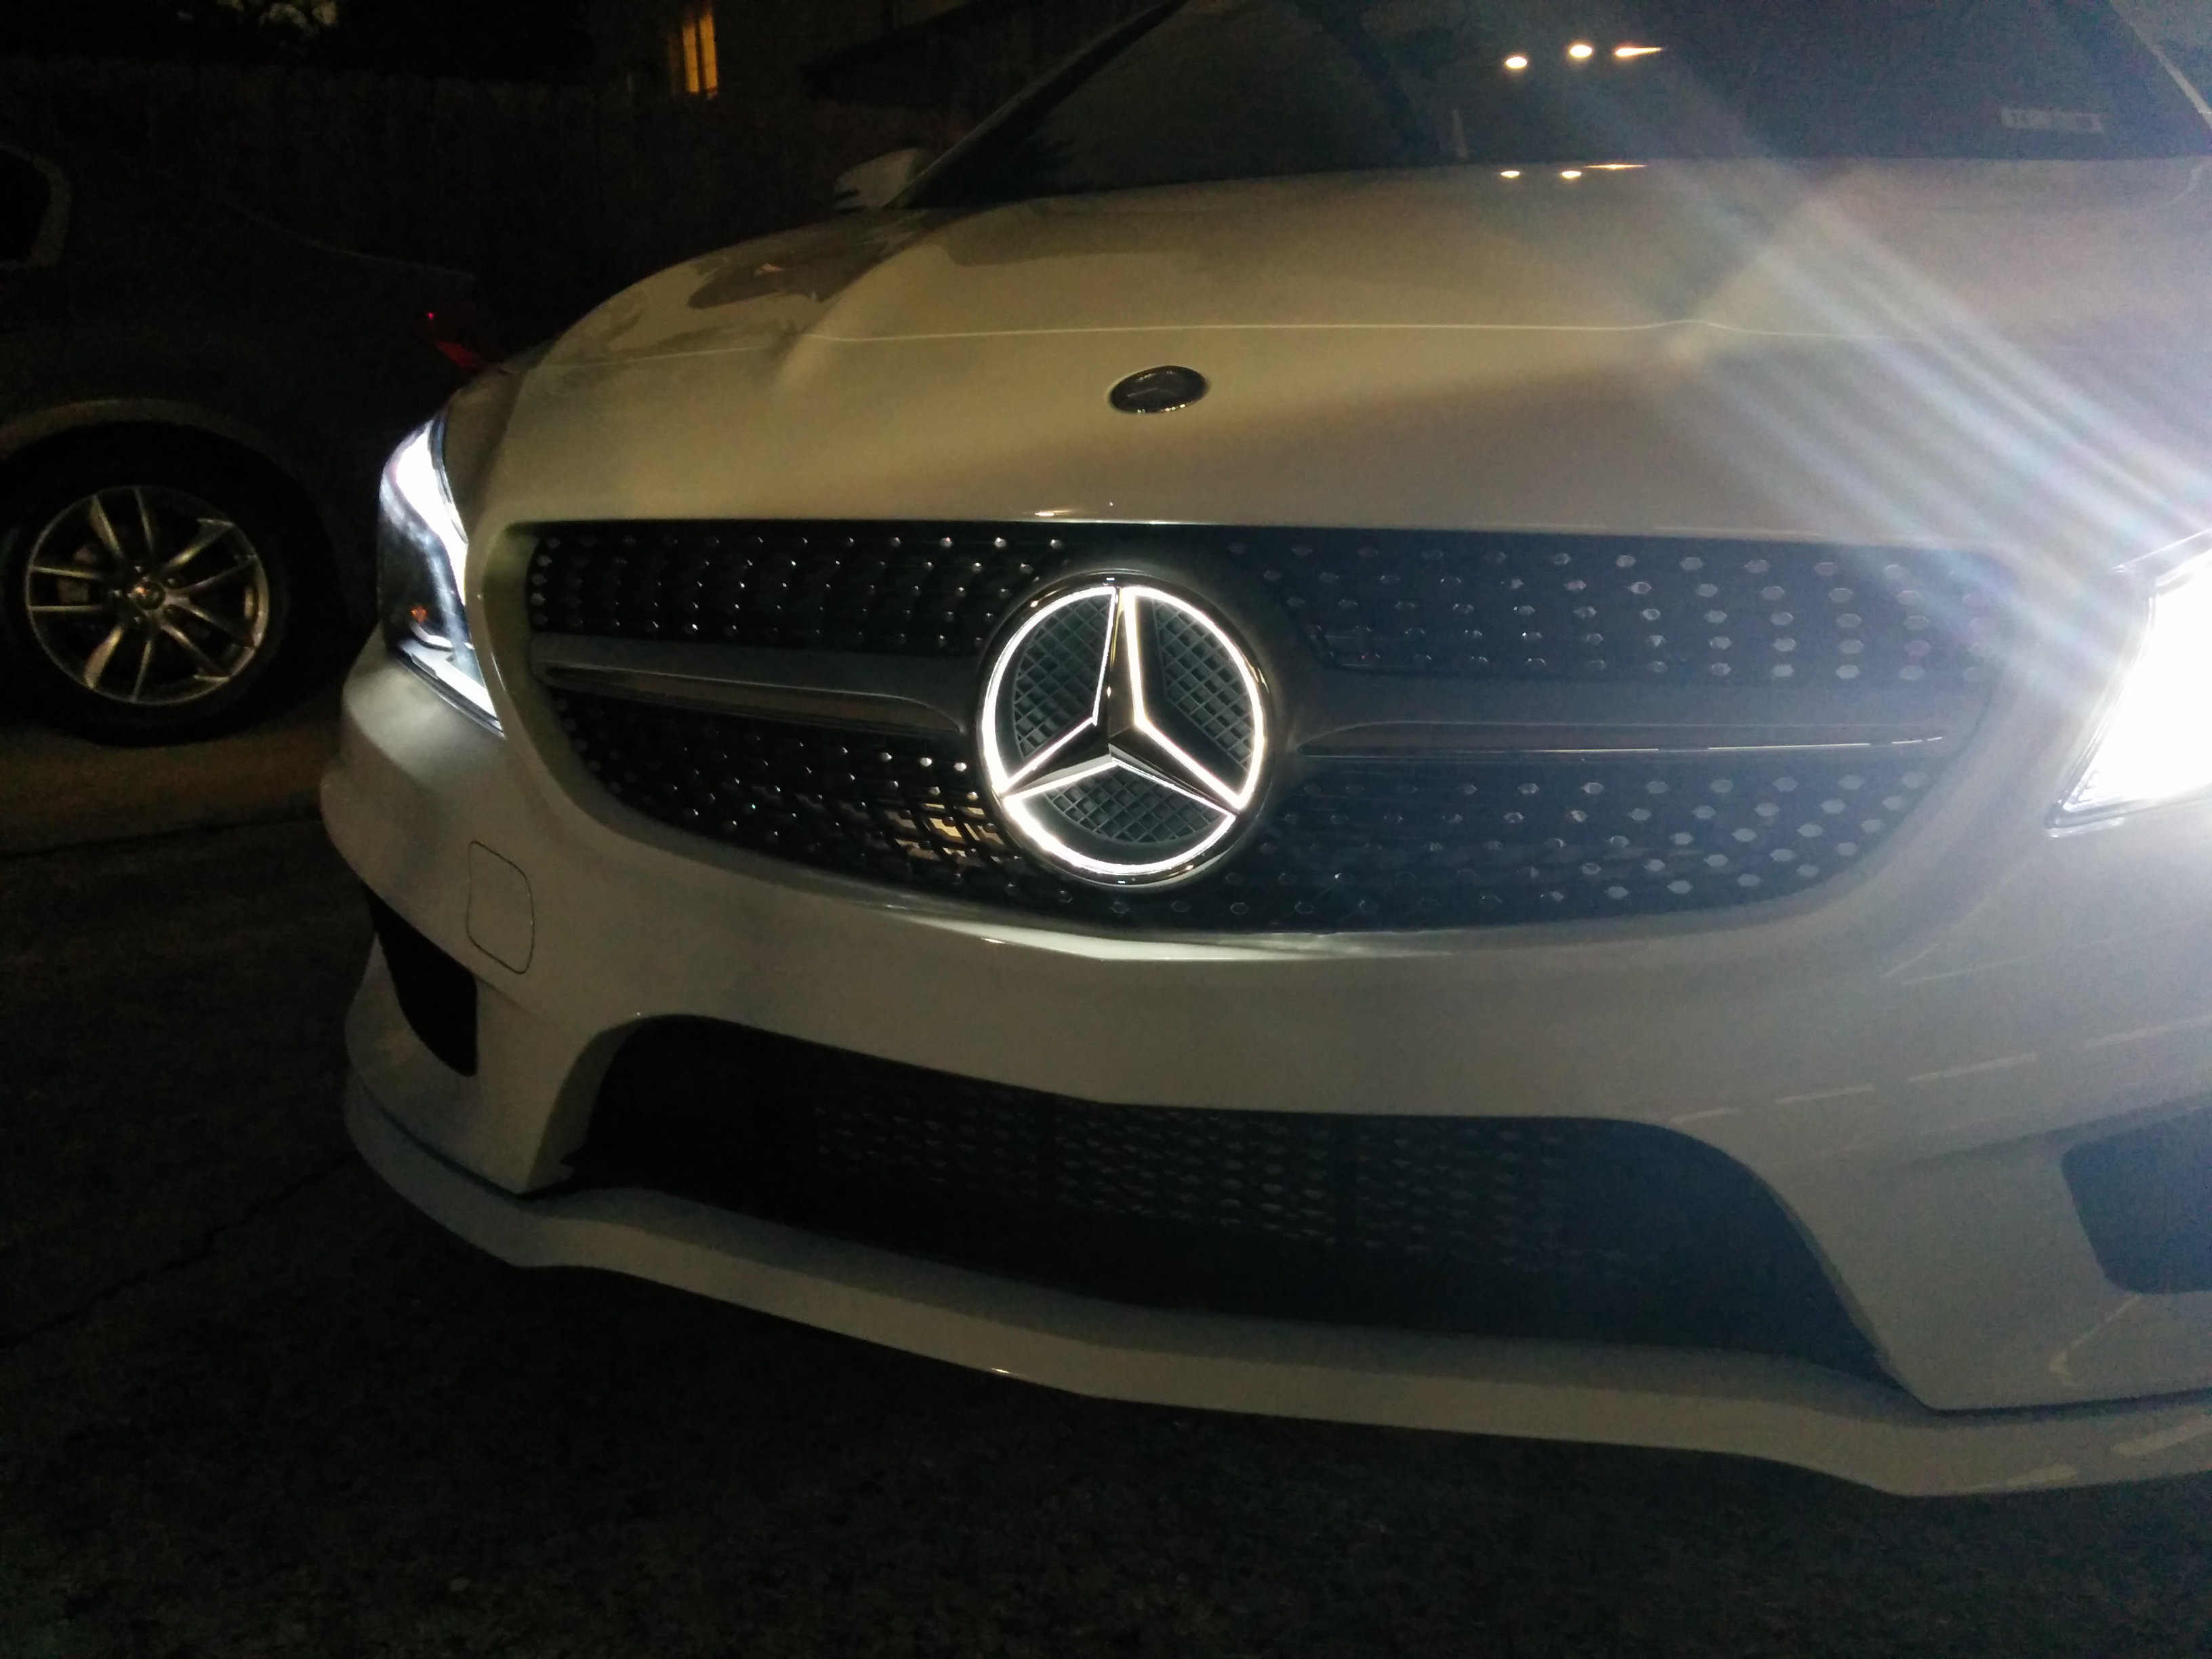 white cla - sport, prem, multimedia, pano, led, illuminated star